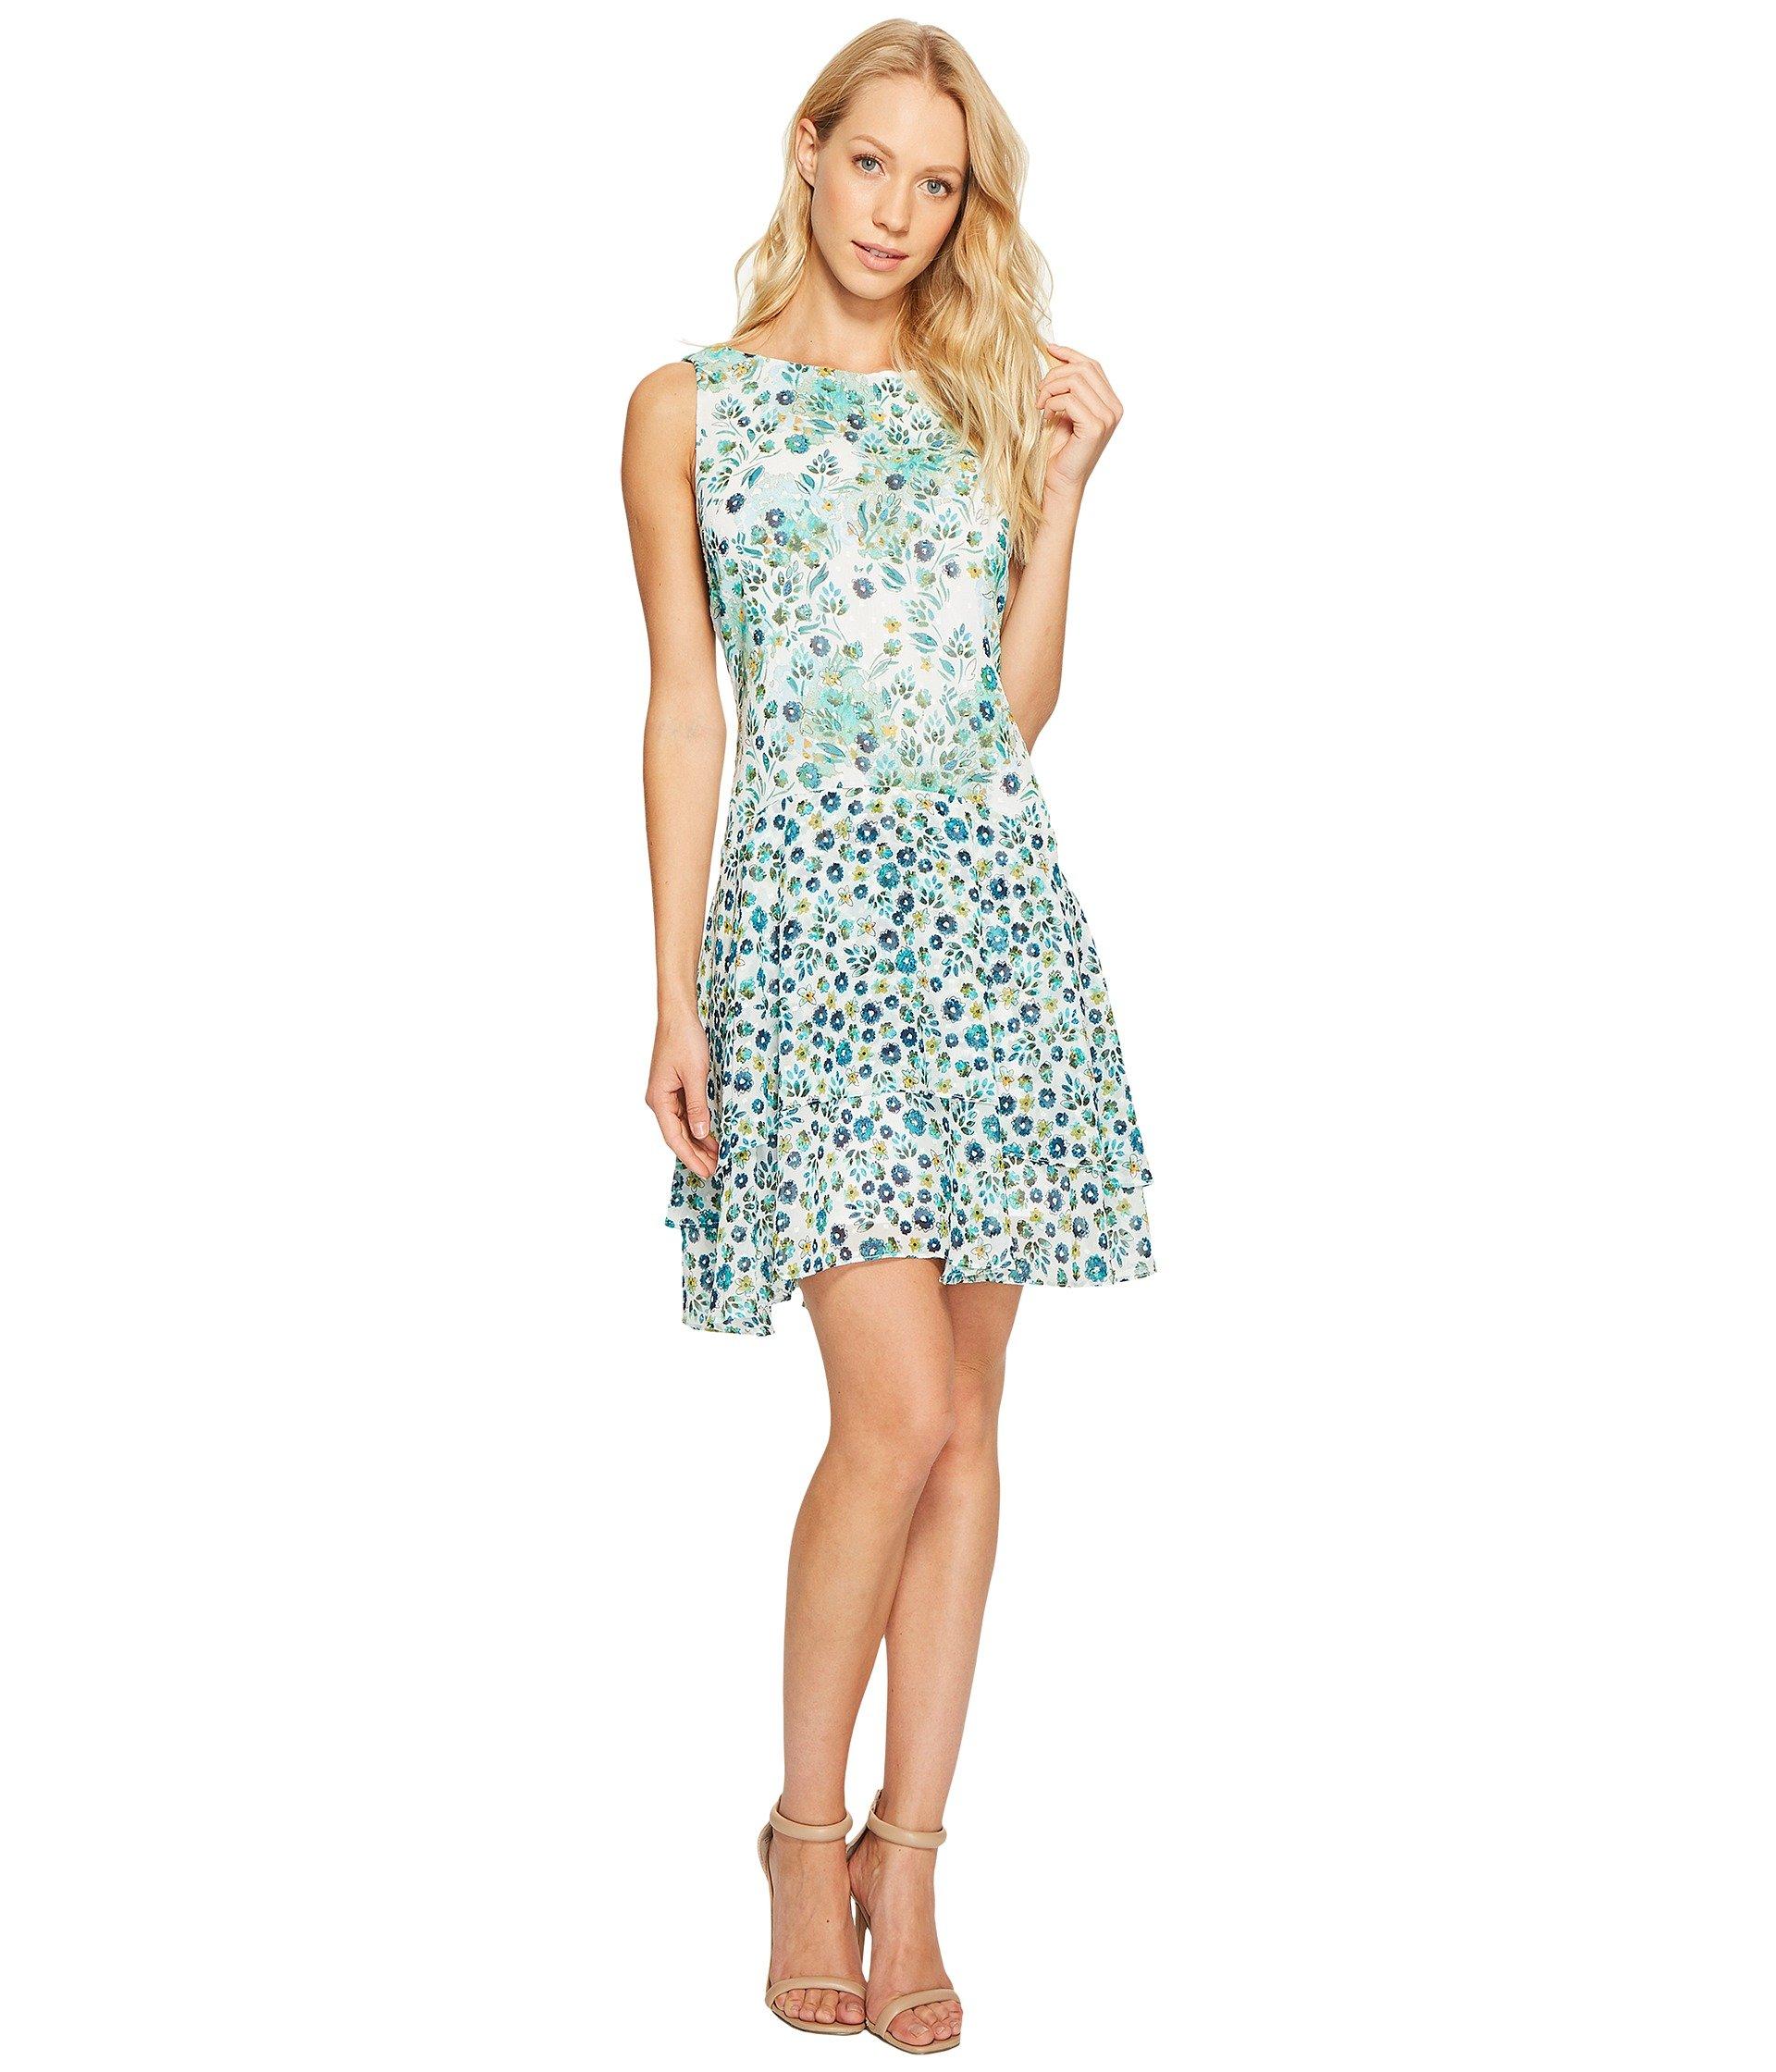 Boat Neck Sleeveless Drop Waist Dress With Ruffle Skirt, Turquoise Multi